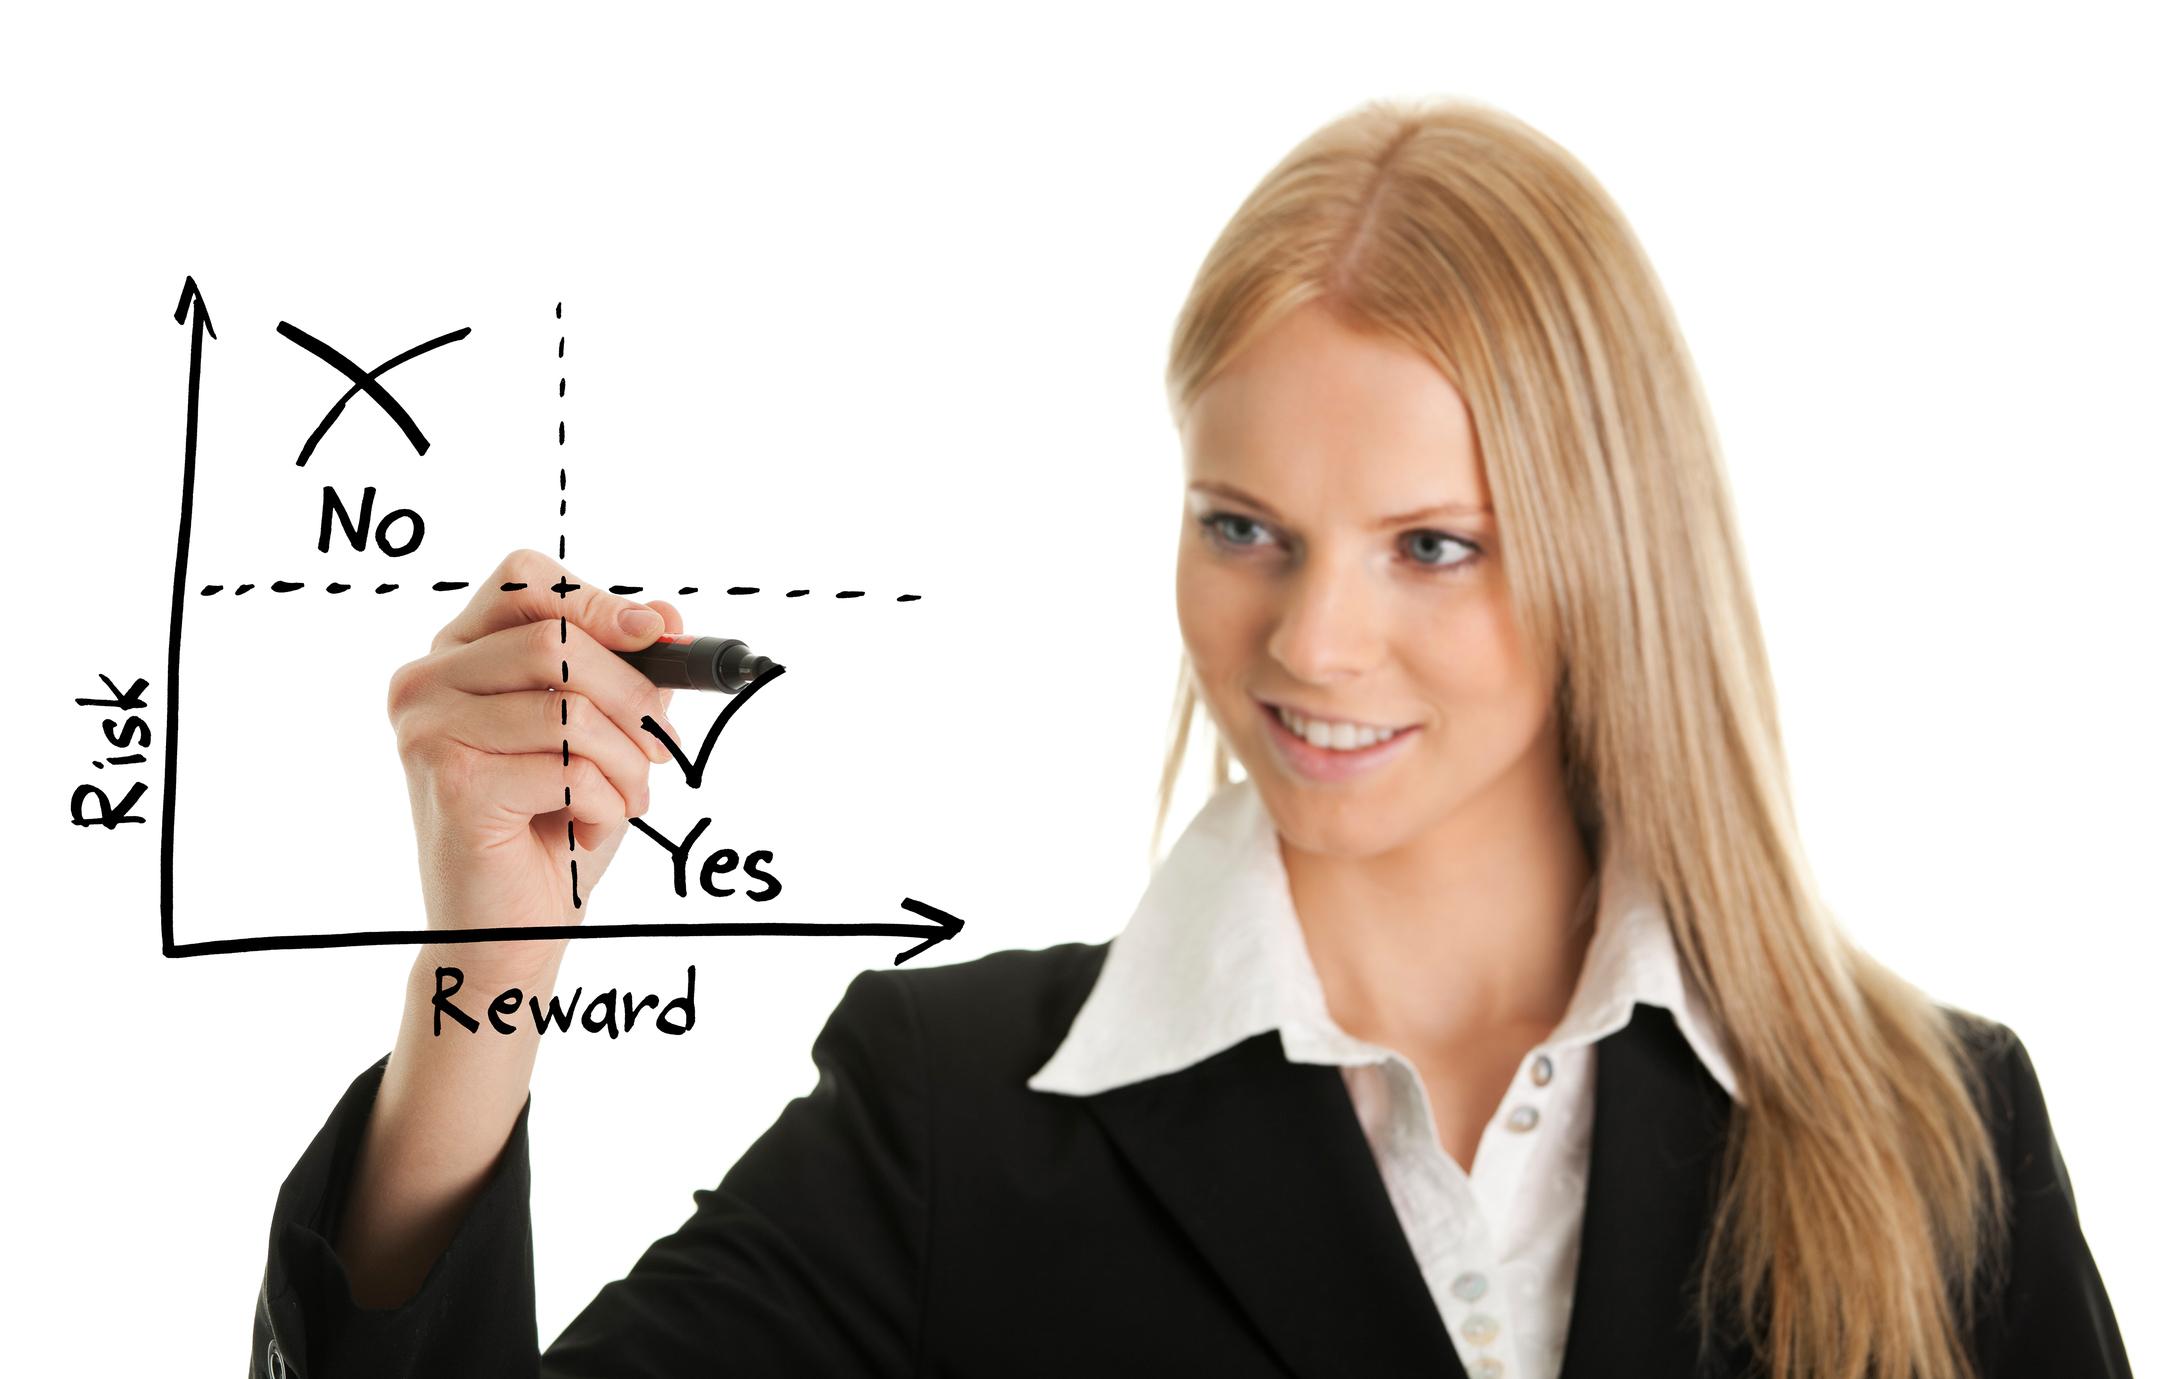 A woman drawing a risk versus reward chart